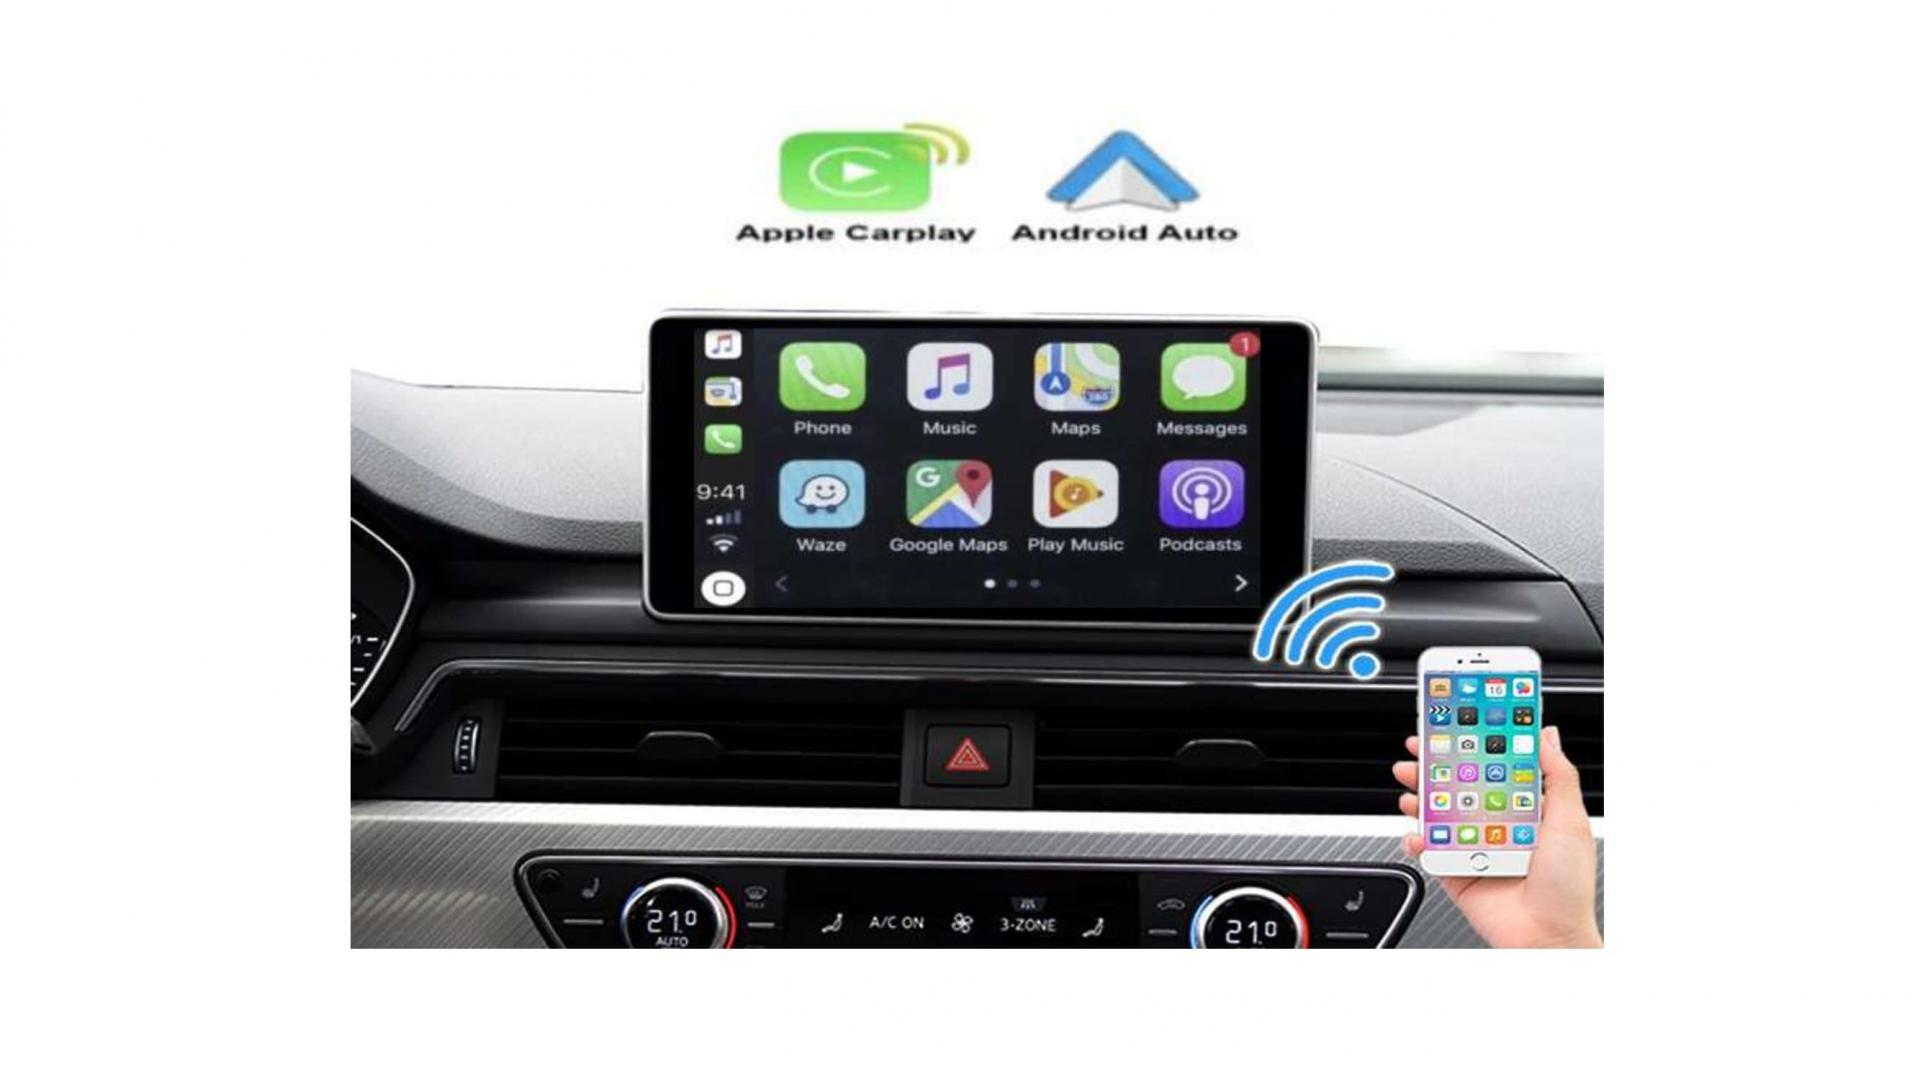 Bmw e70 e71 f20 f23 21 7 f06 f12 g11 x3 f25 z4 x4carplay android auto gps autoradio i3 x3 m3 m5 x1 f48 x2 f39 2010 2011 2012 2013 2014 2015 2016 2017 2018 2019 e84 x5 x6 serie 1 se